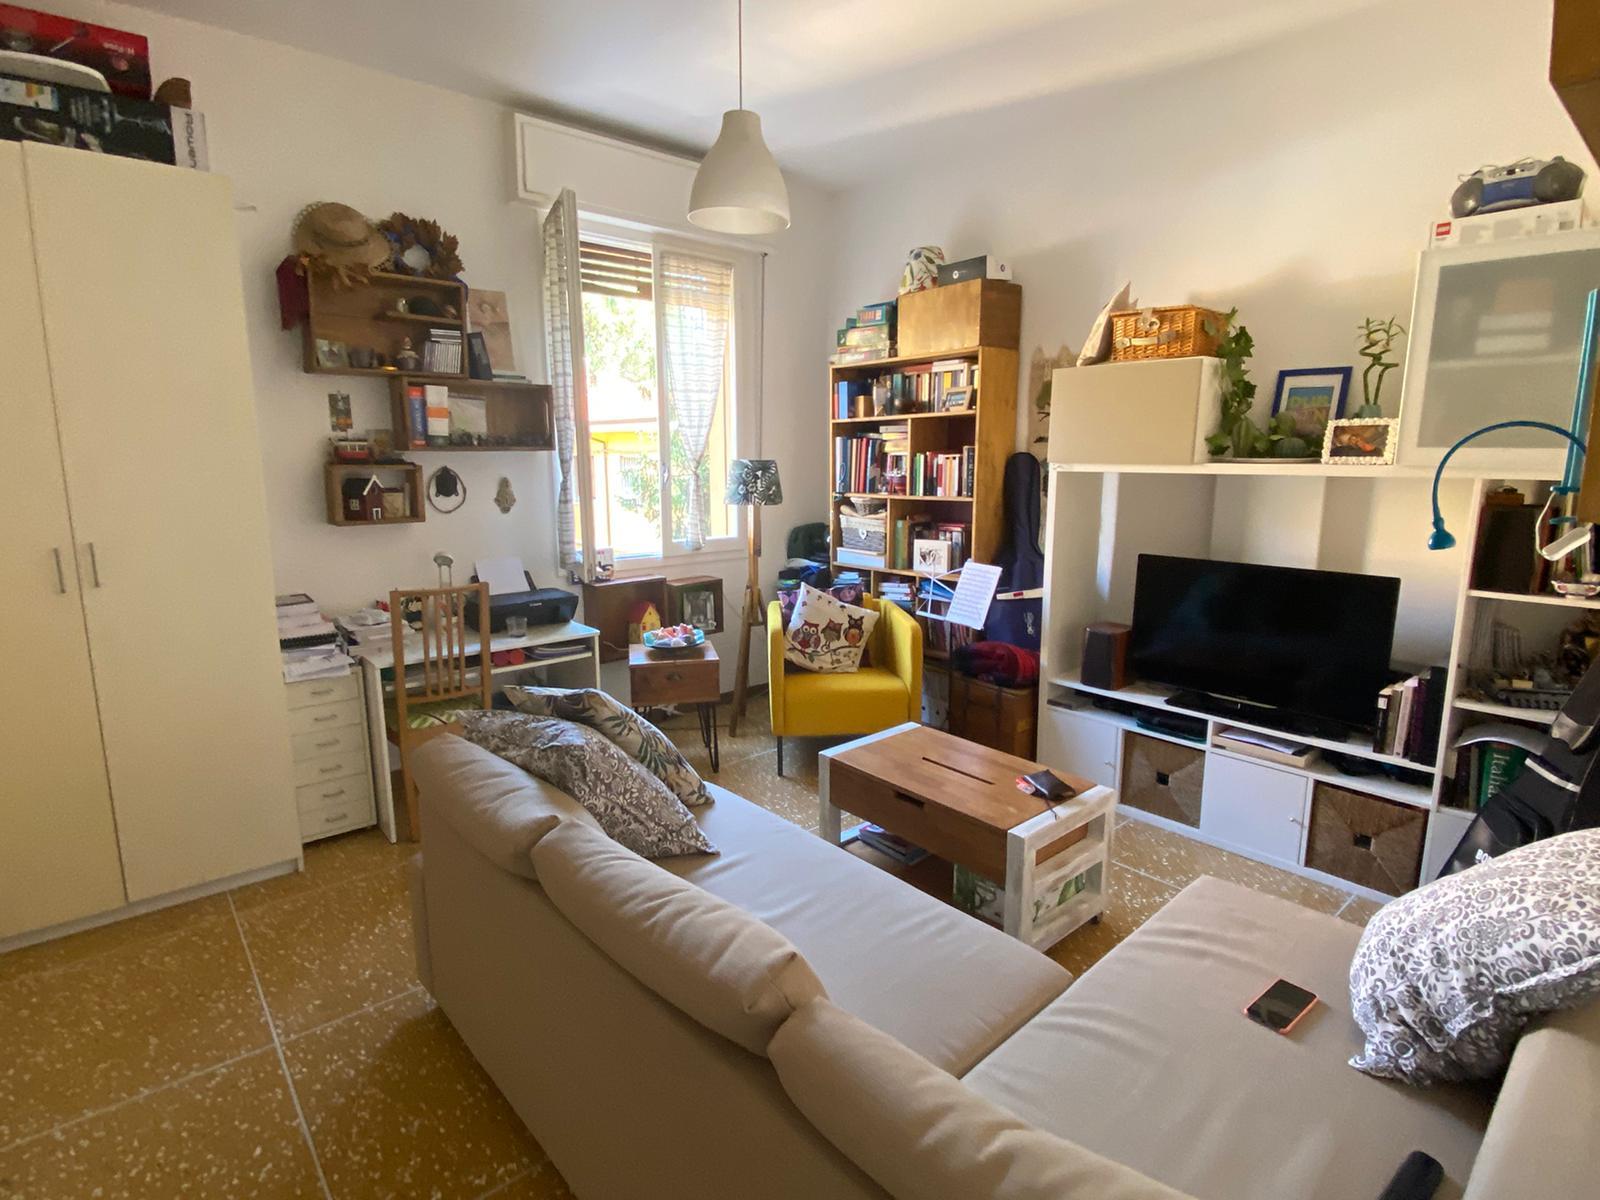 Vendita appartamento Massarenti mq. 80